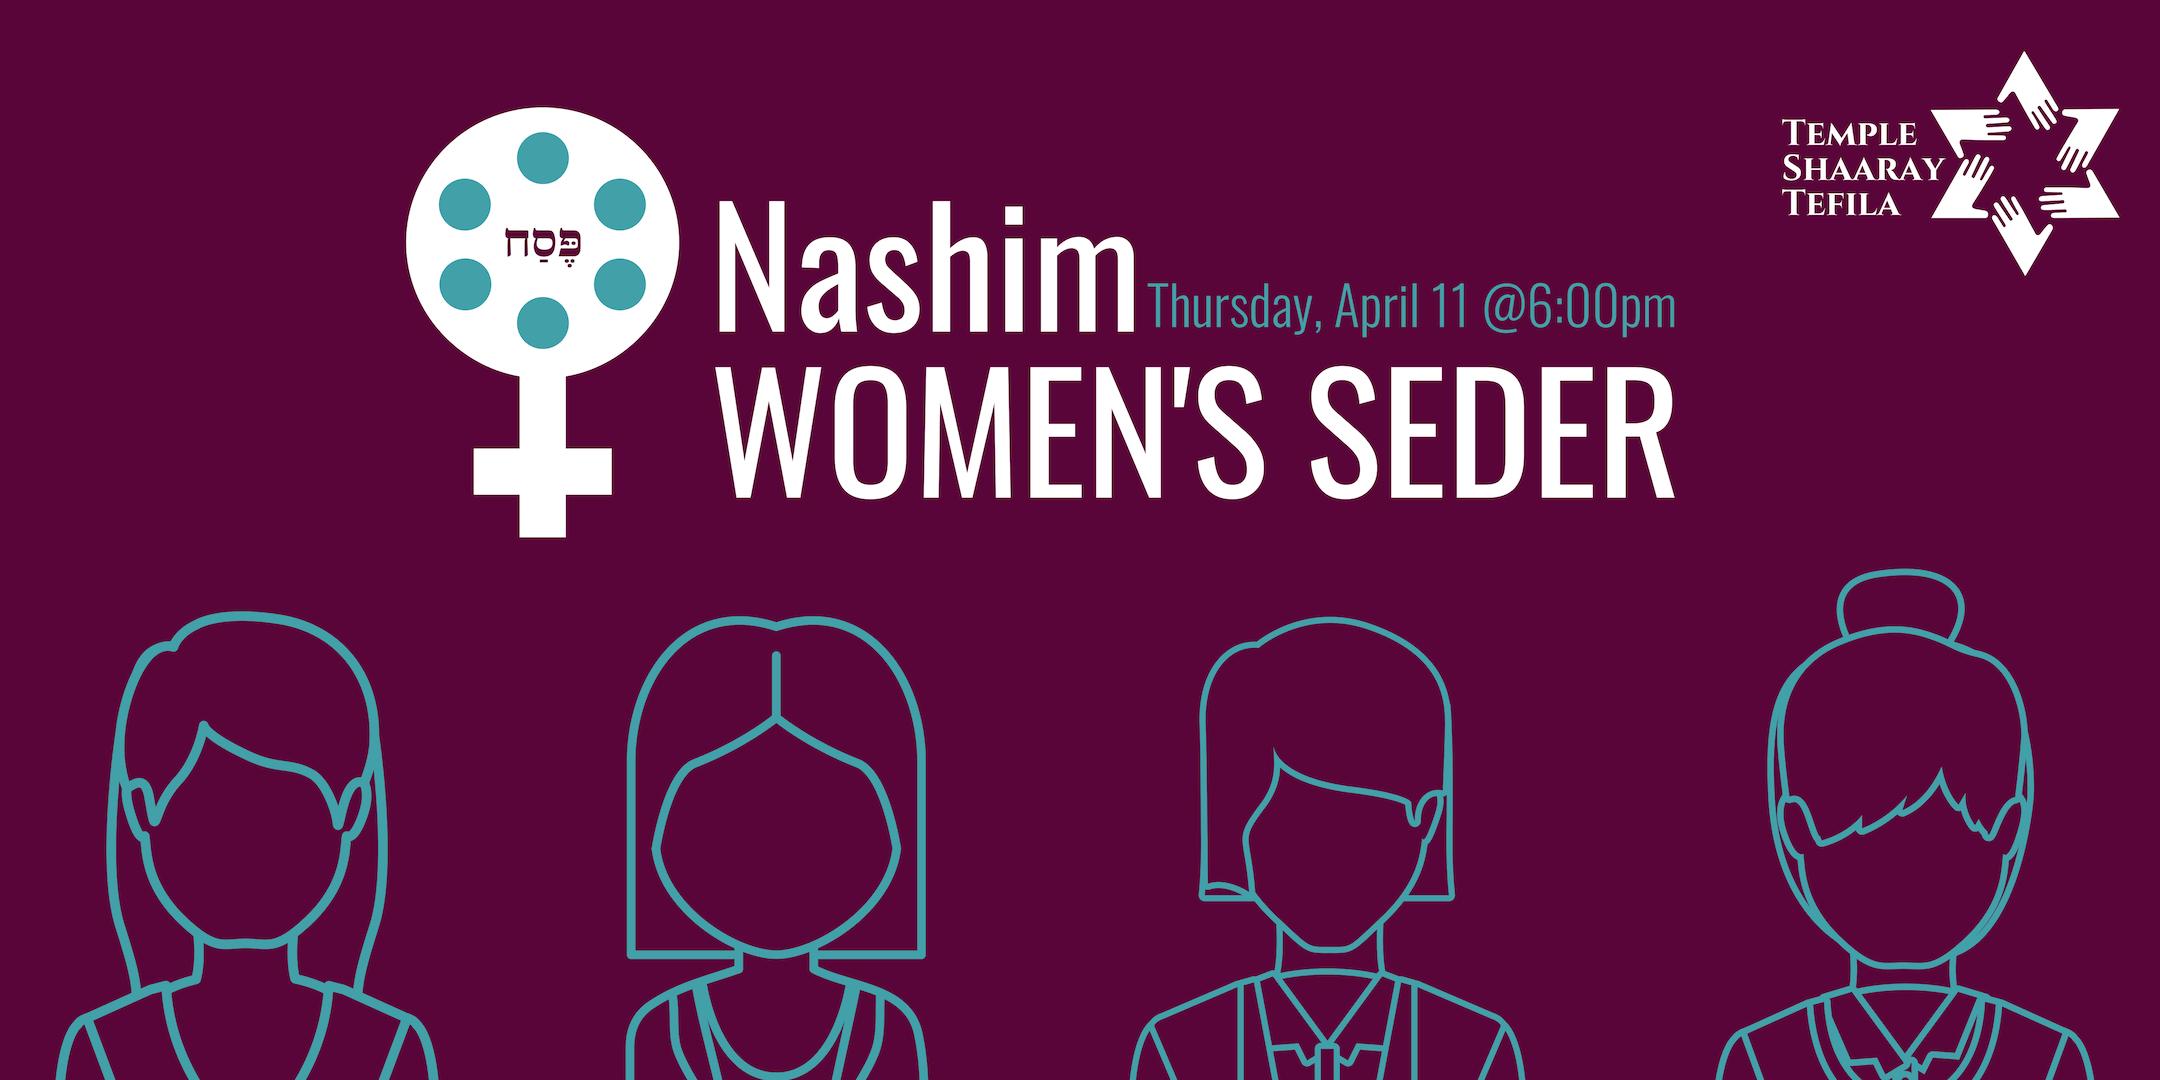 Nashim Women's Seder - Temple Shaaray Tefila